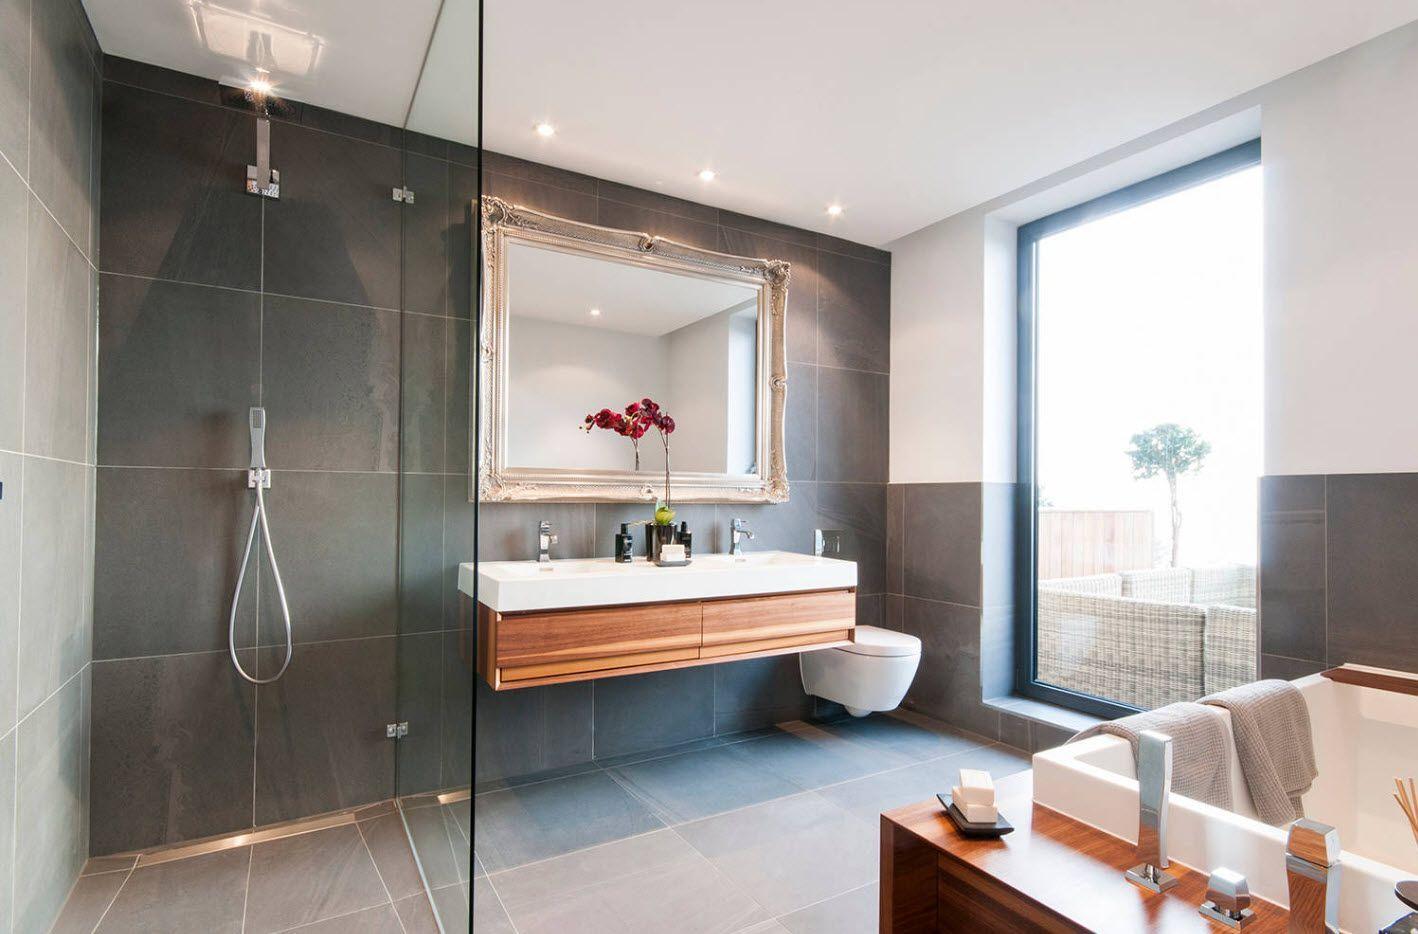 graphite gray interior design for the two zones of vertical aligned bathroom